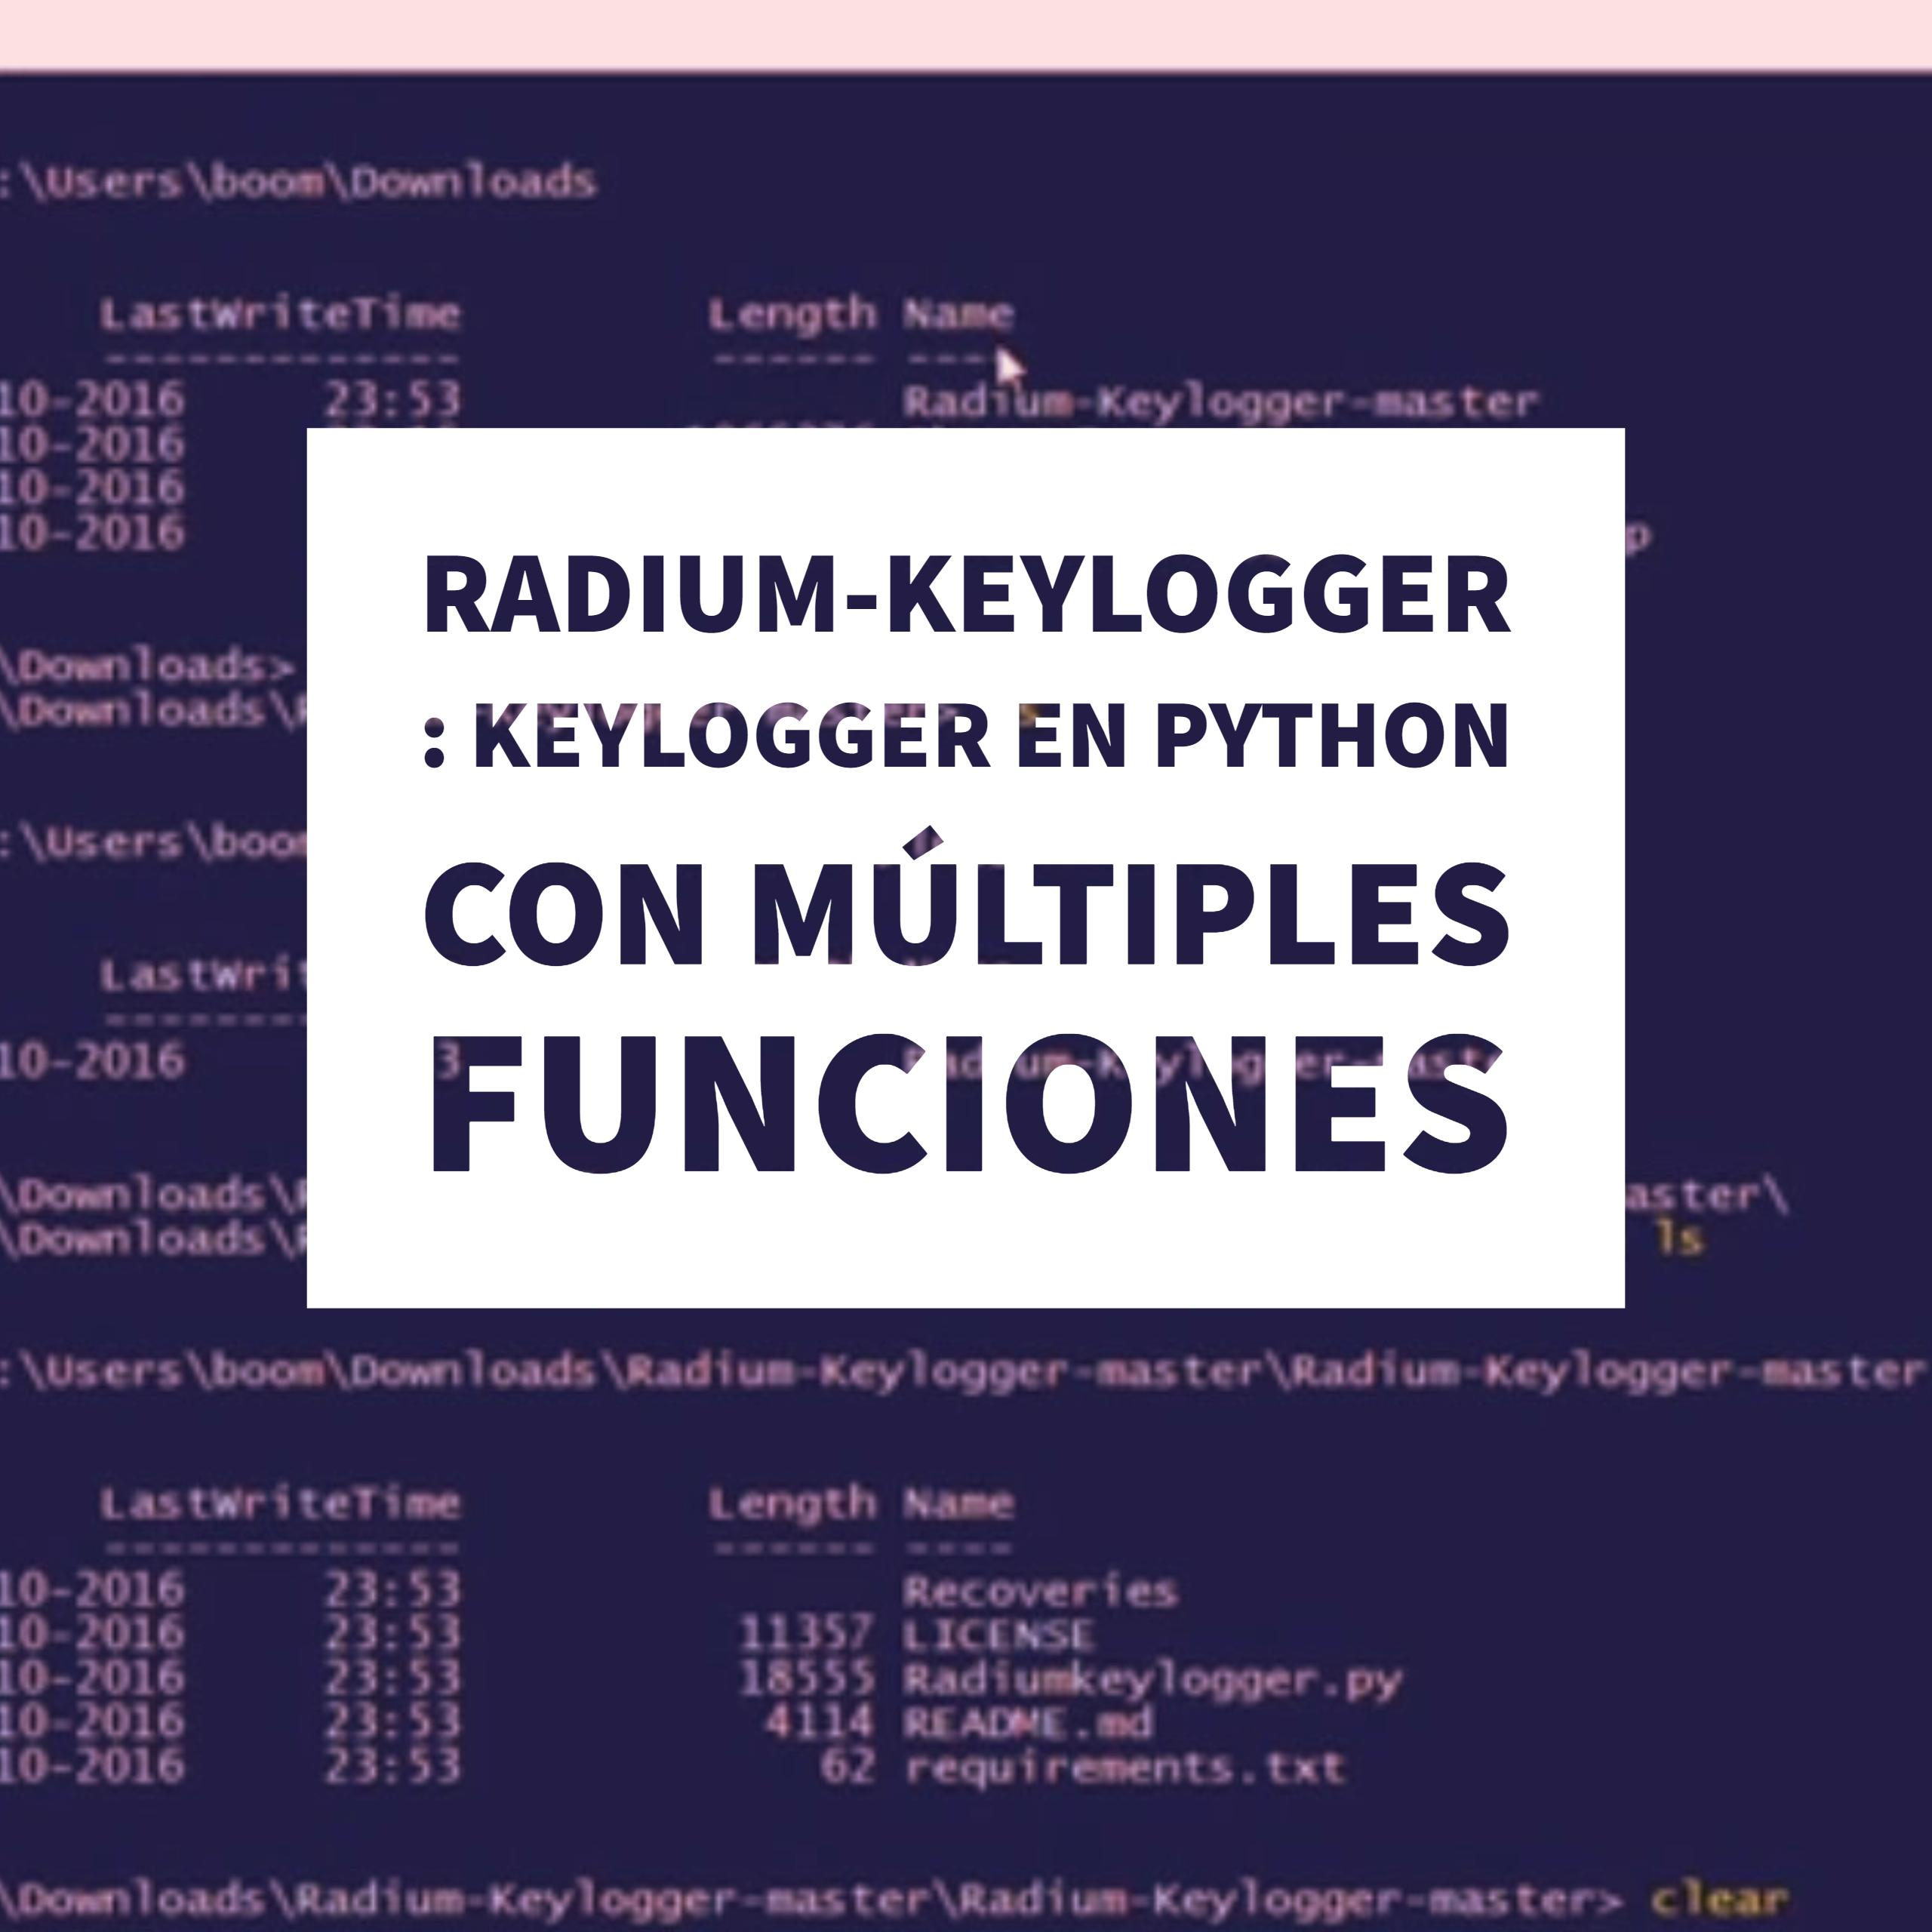 Radium-Keylogger : Keylogger en python con múltiples funciones [Video]